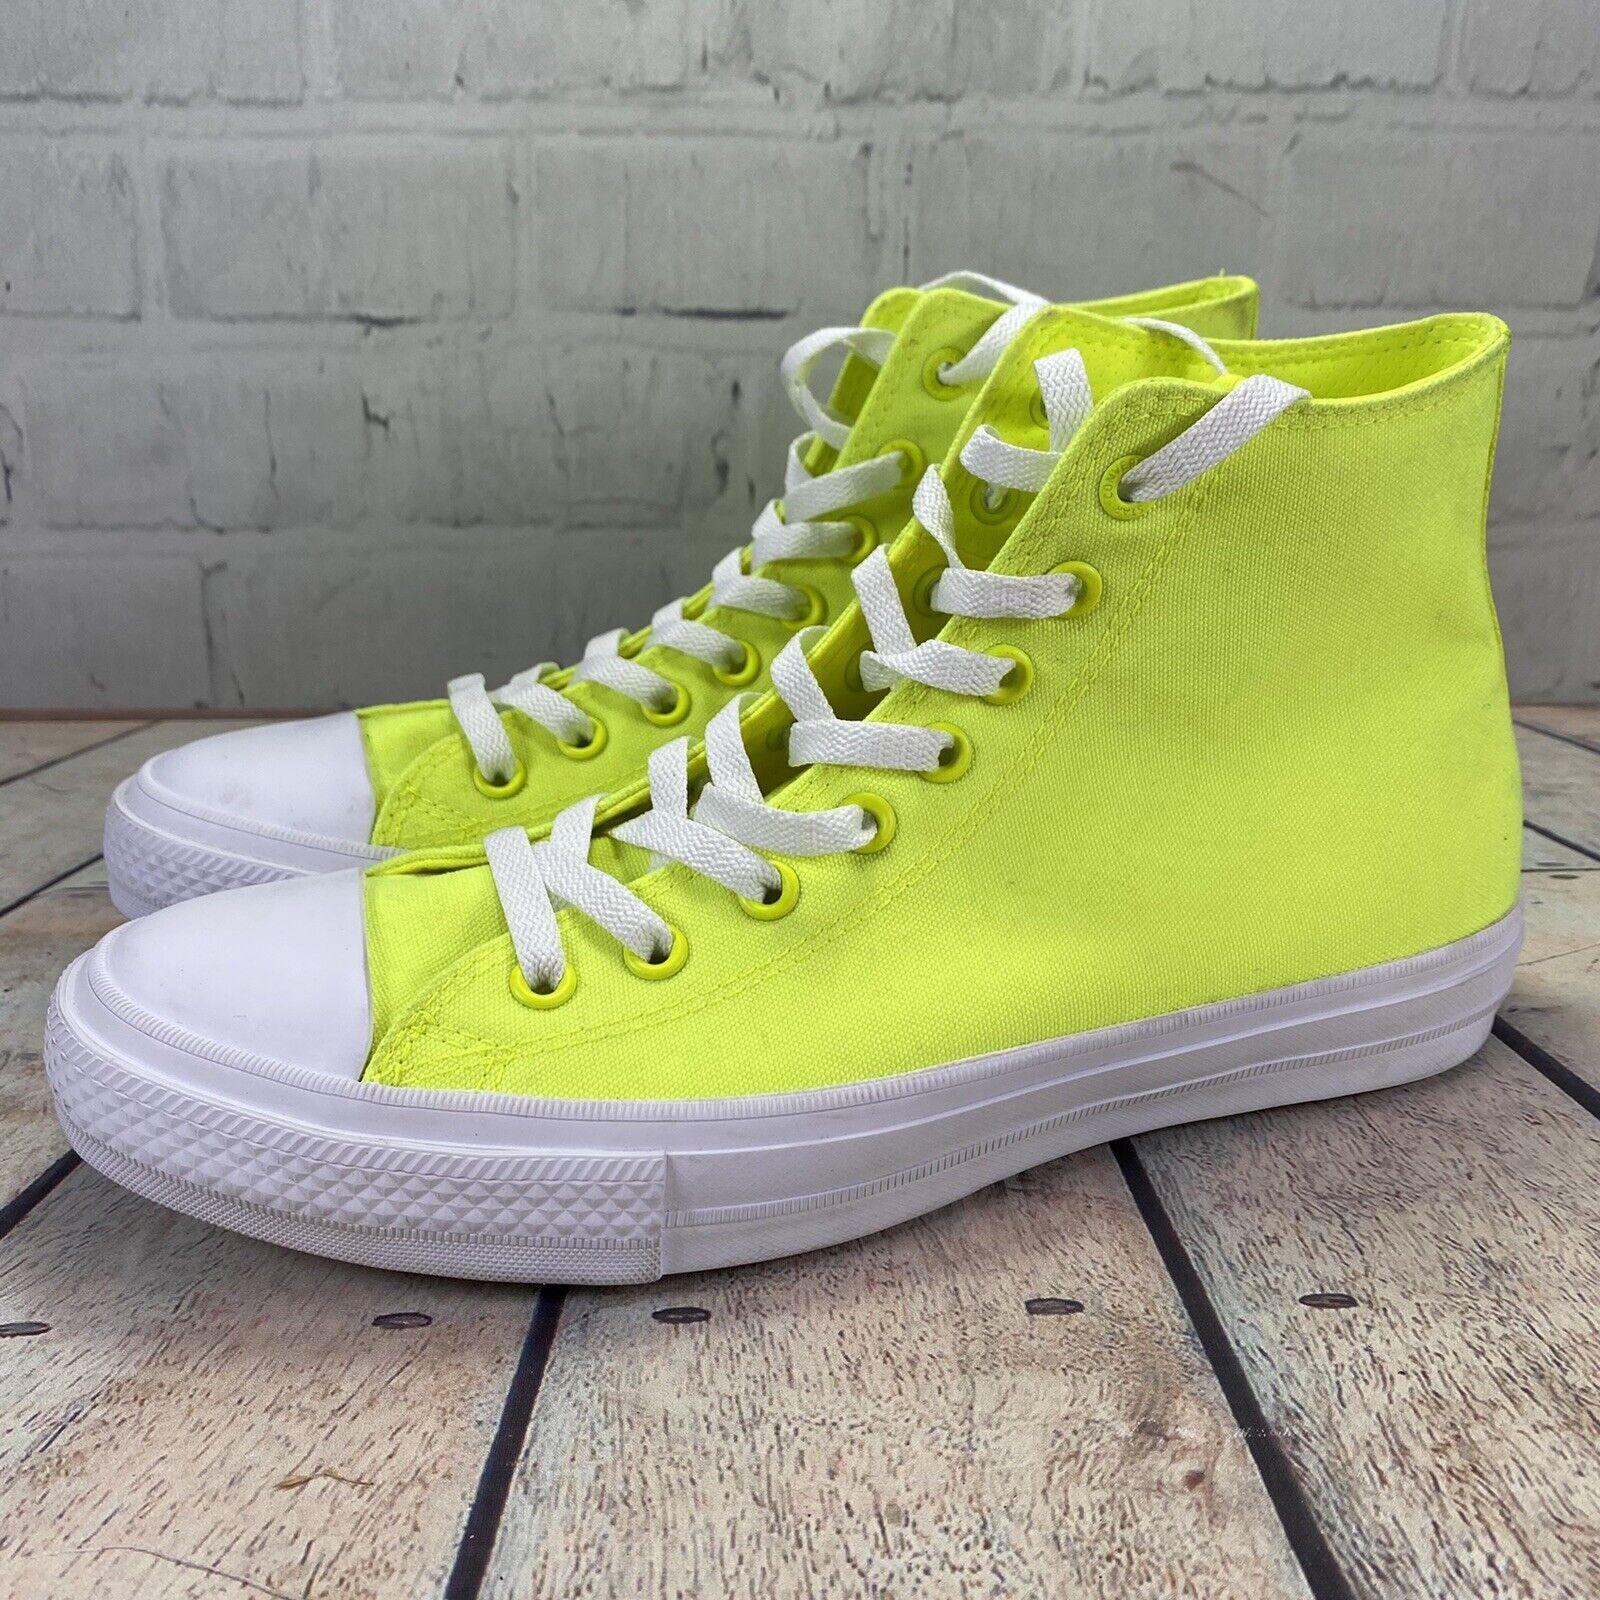 Converse Wiz Khalifa Ct Chuck Taylor Lo